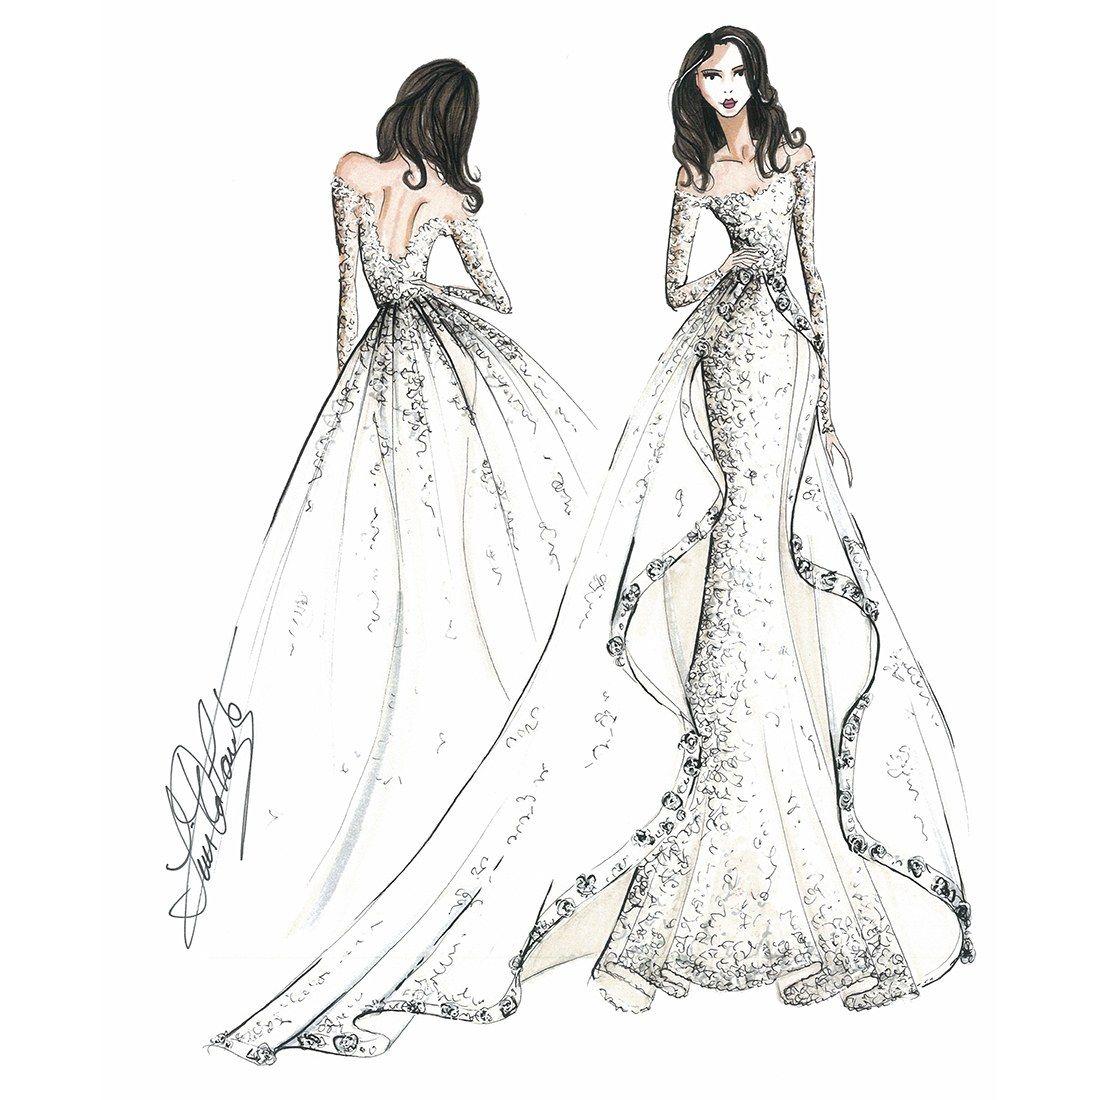 Meghan Markle Wedding Dress Designer.Meghan Markle S Wedding Dress Will Look Like This According To